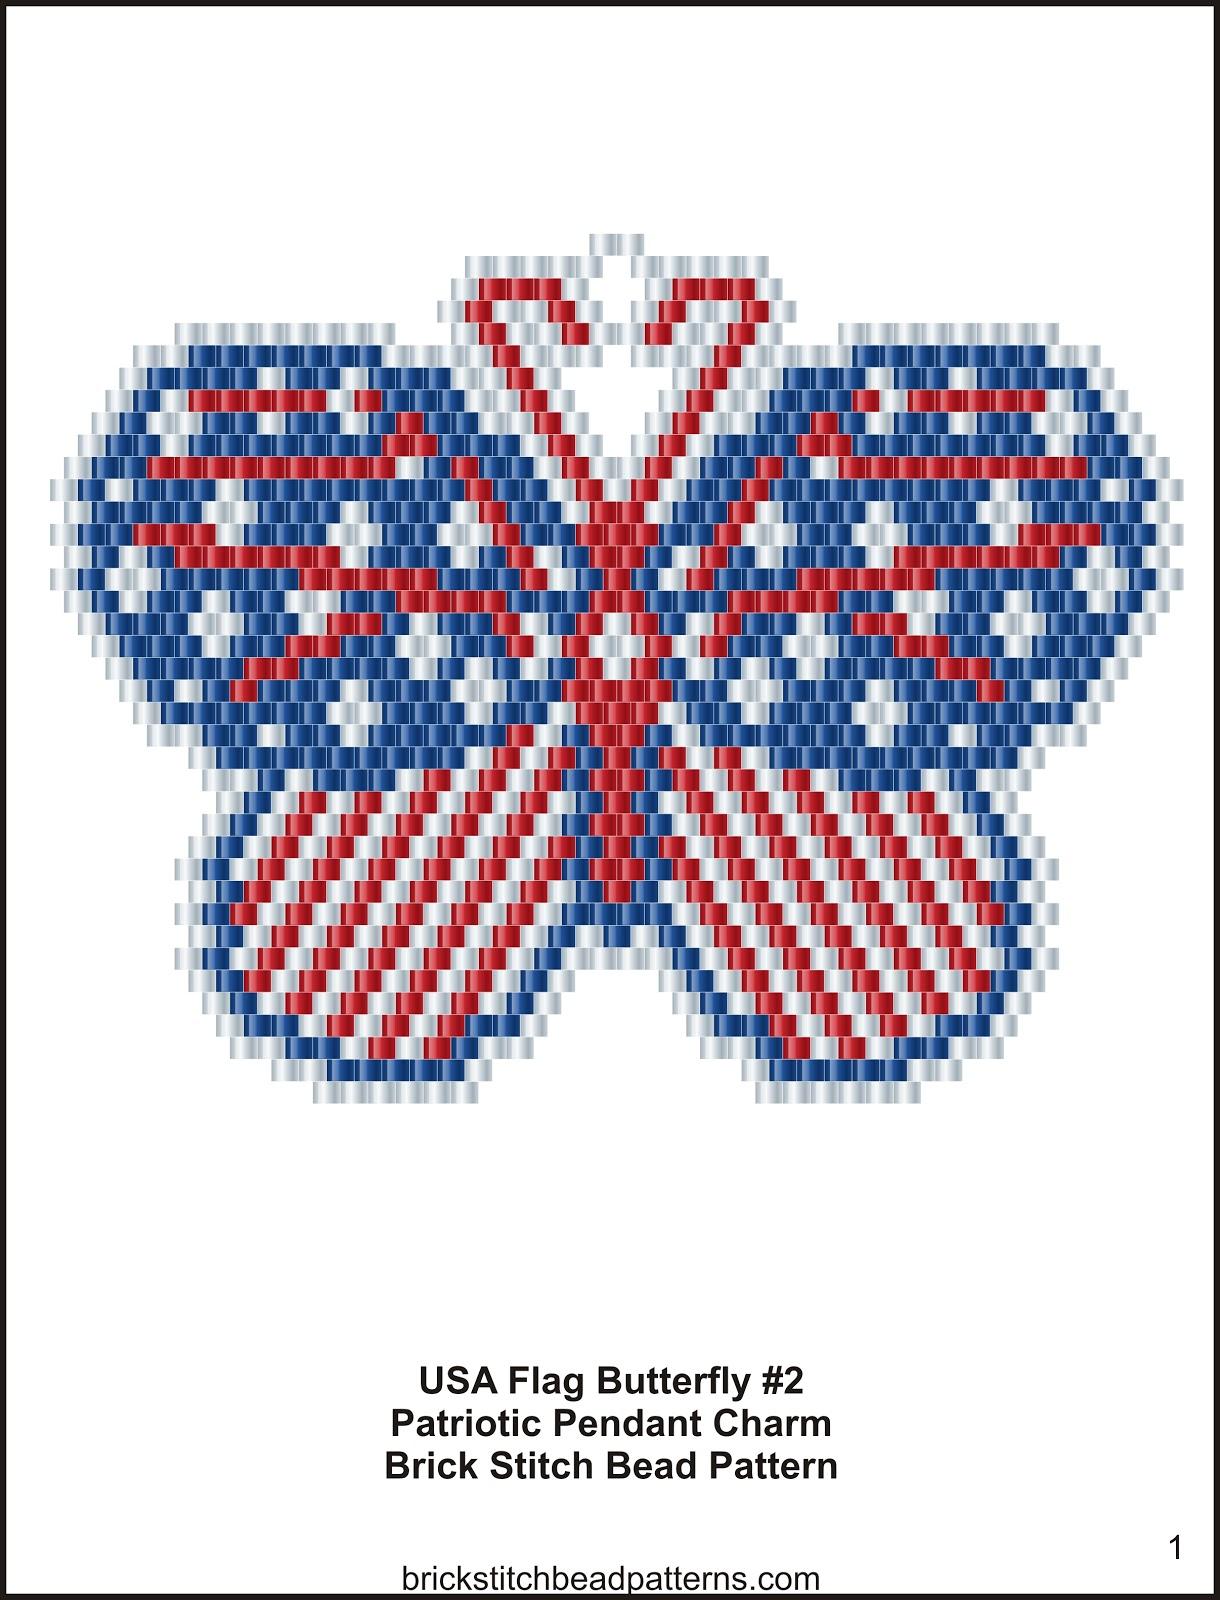 Brick Stitch Bead Patterns Journal Usa Flag Butterfly 2